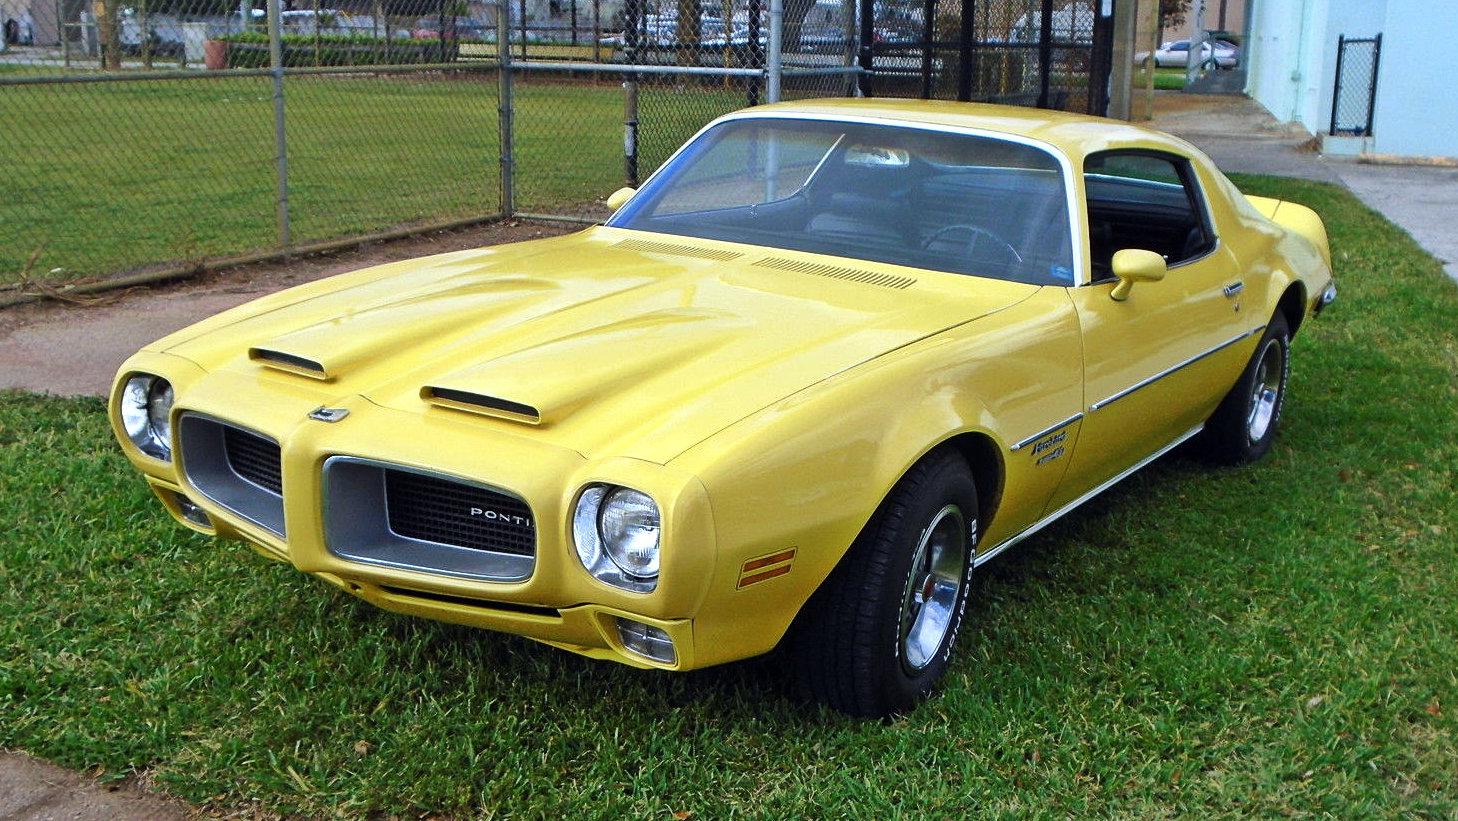 yellow gold 1970 pontiac firebird formula 400. Black Bedroom Furniture Sets. Home Design Ideas